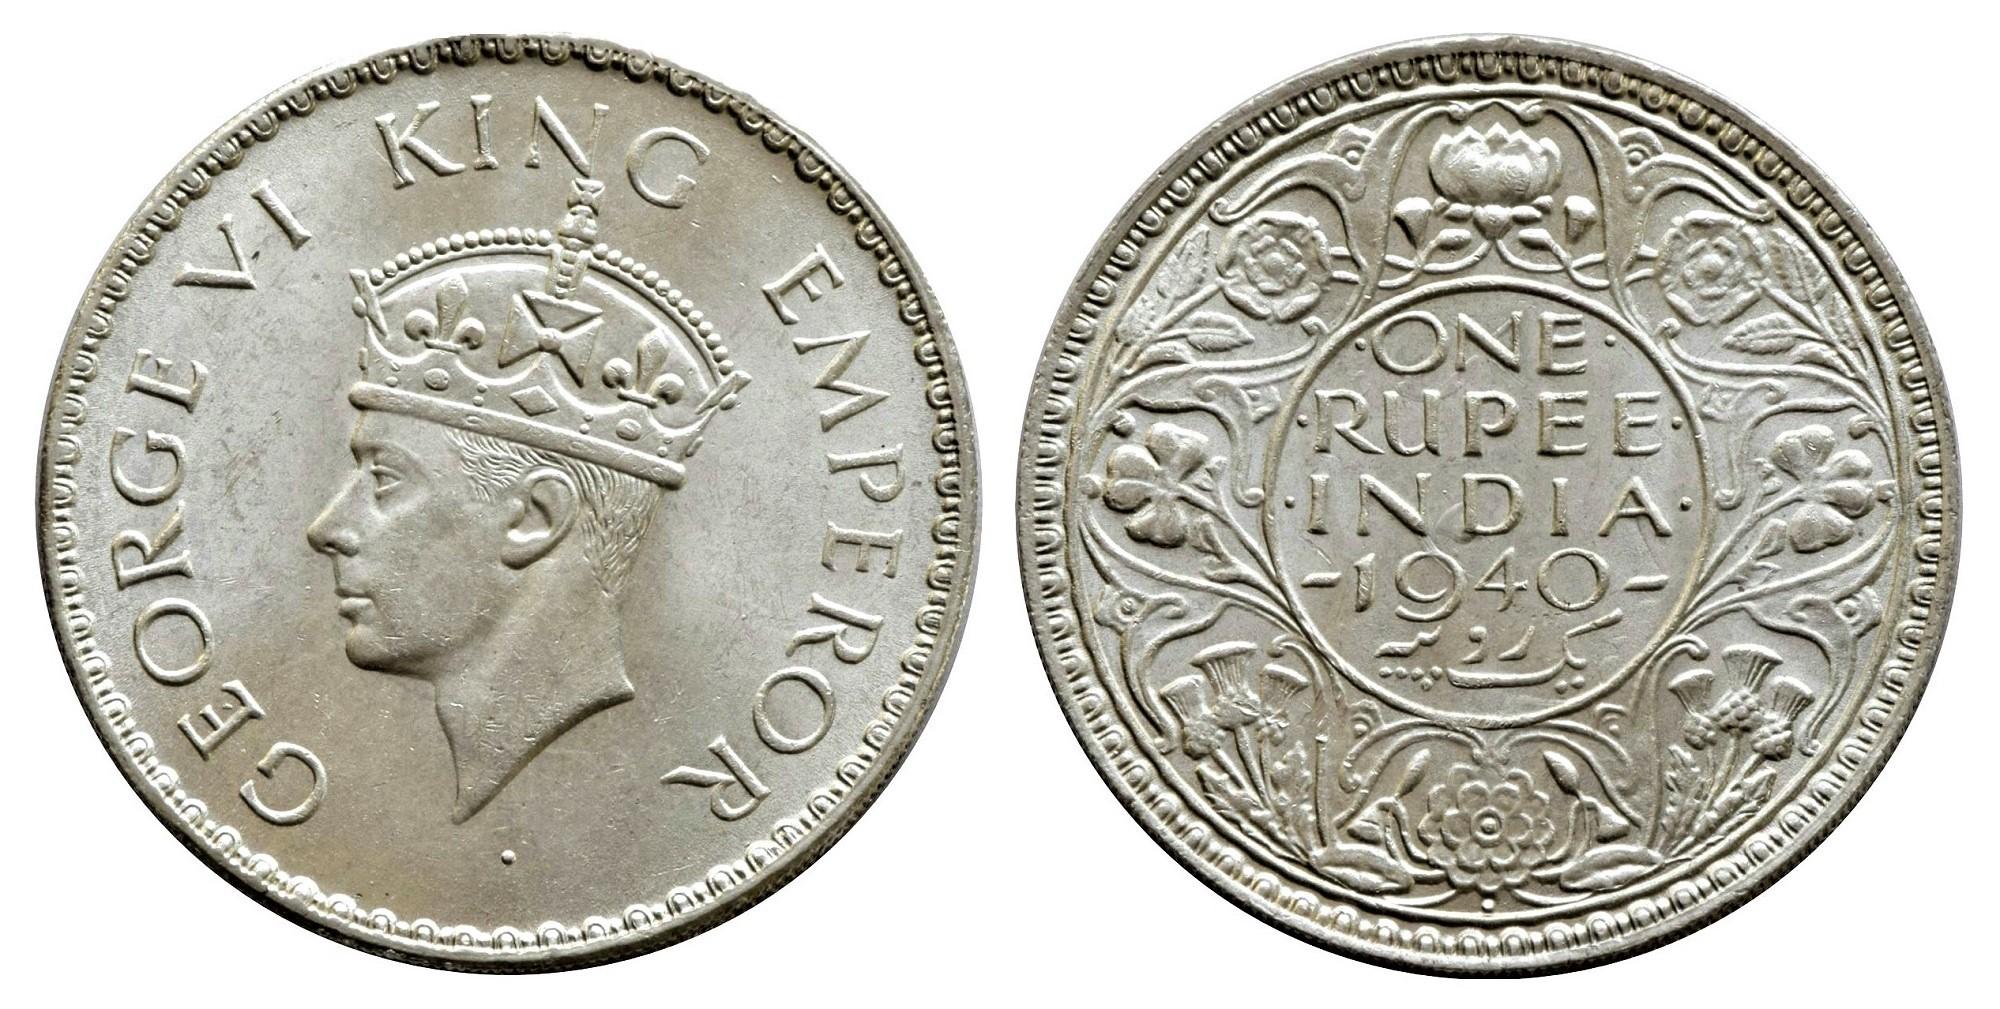 File:Indian rupee (1940).jpg - Wikimedia Commons